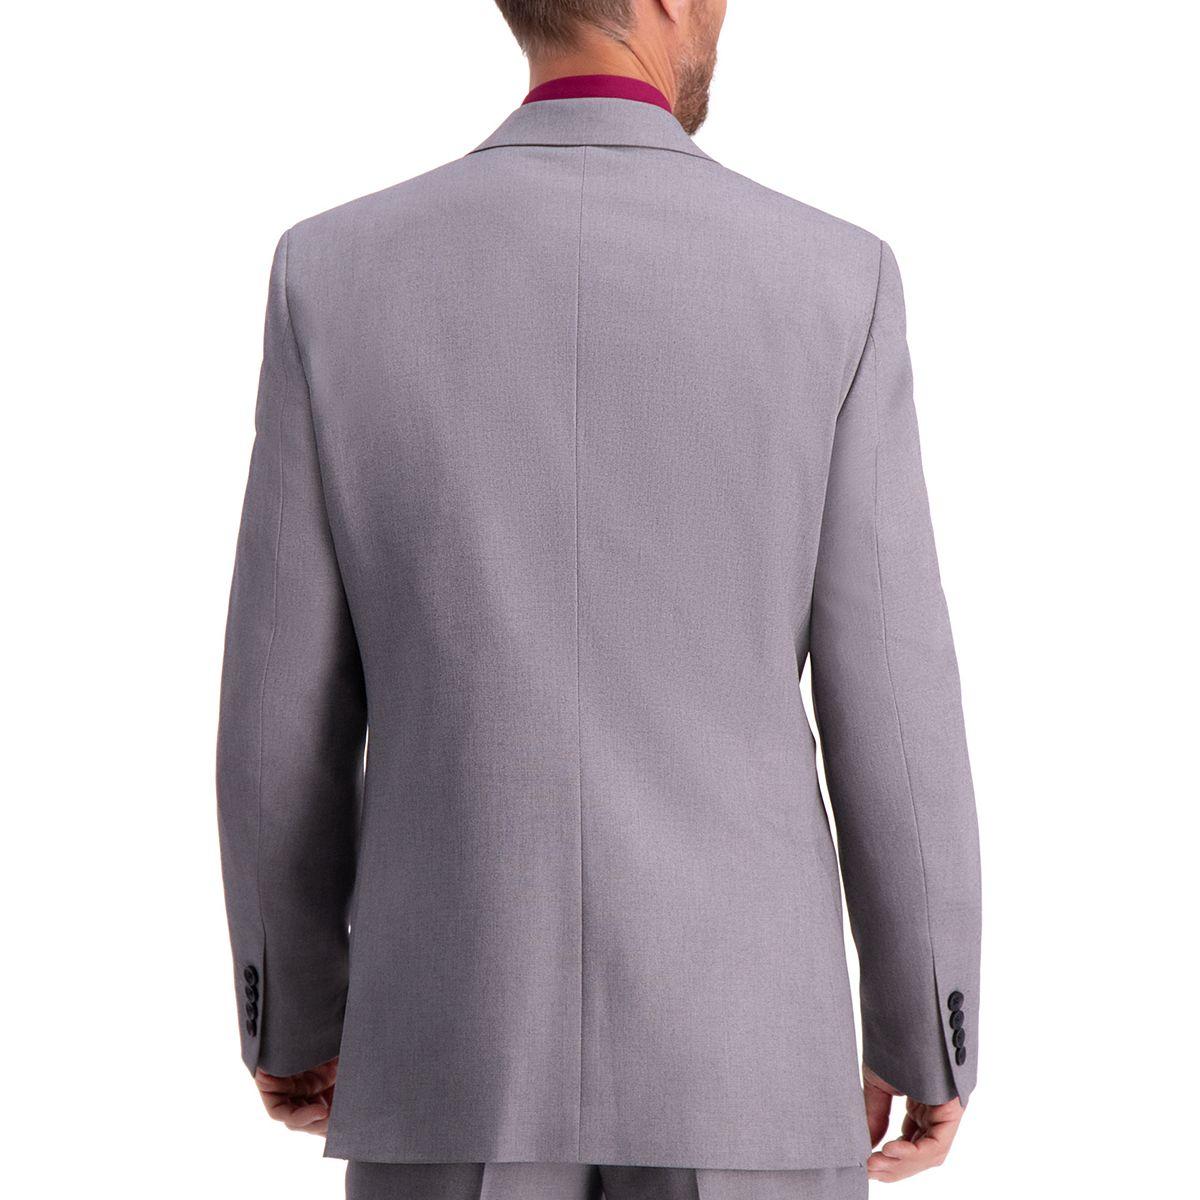 Men's Haggar® Travel Performance Tailored Fit Stretch Suit Jacket Dark Gray Heather Sjnsm